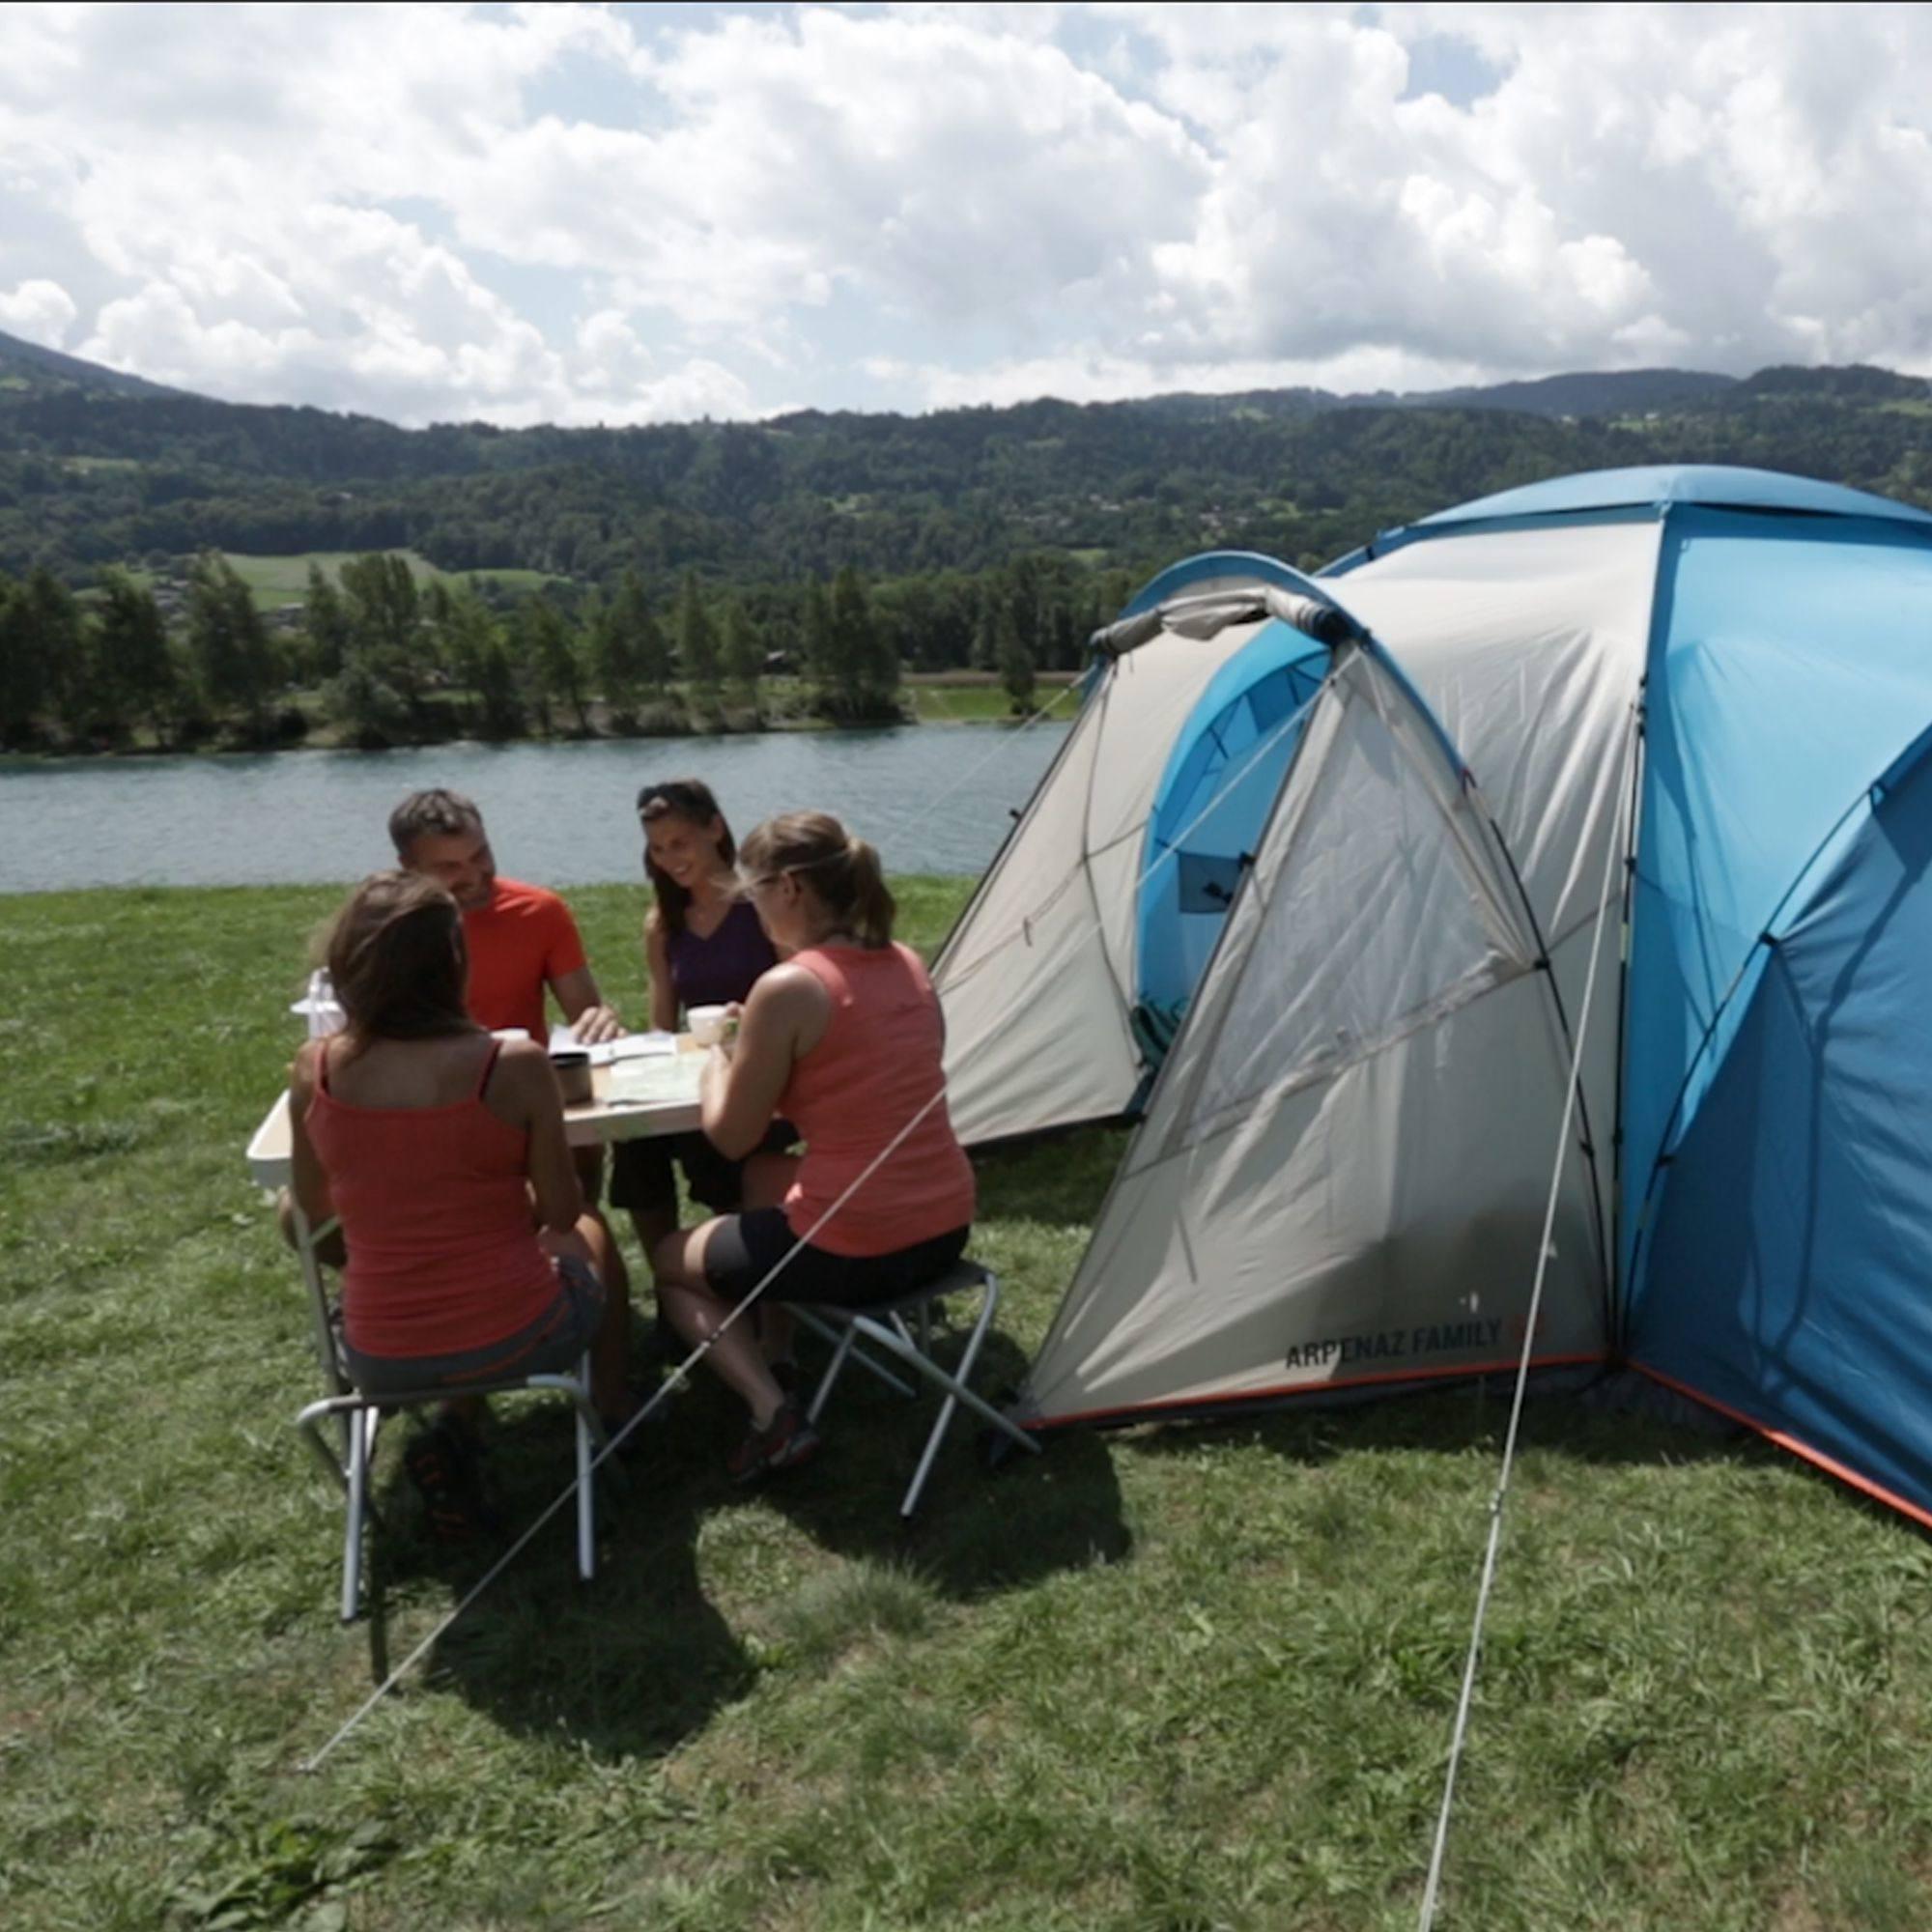 Tente de camping familiale arpenaz 6 3 i 6 personnes clubs collectivit s decathlon pro - Tente camping 3 chambres ...